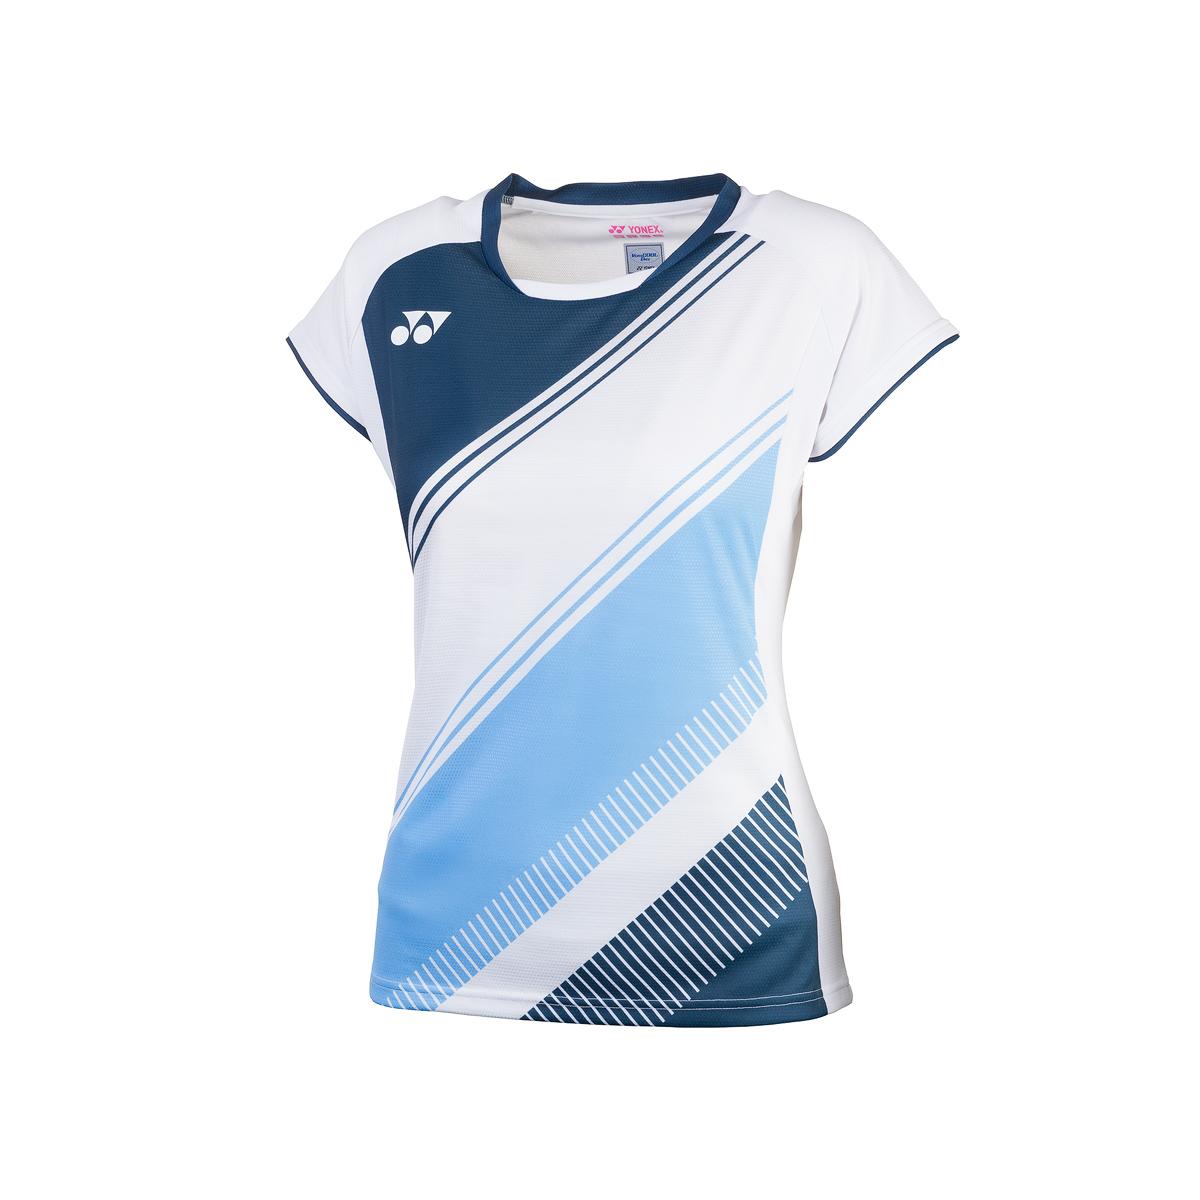 Women's Crew Neck Shirt Badminton TournamentDetailbild - 4